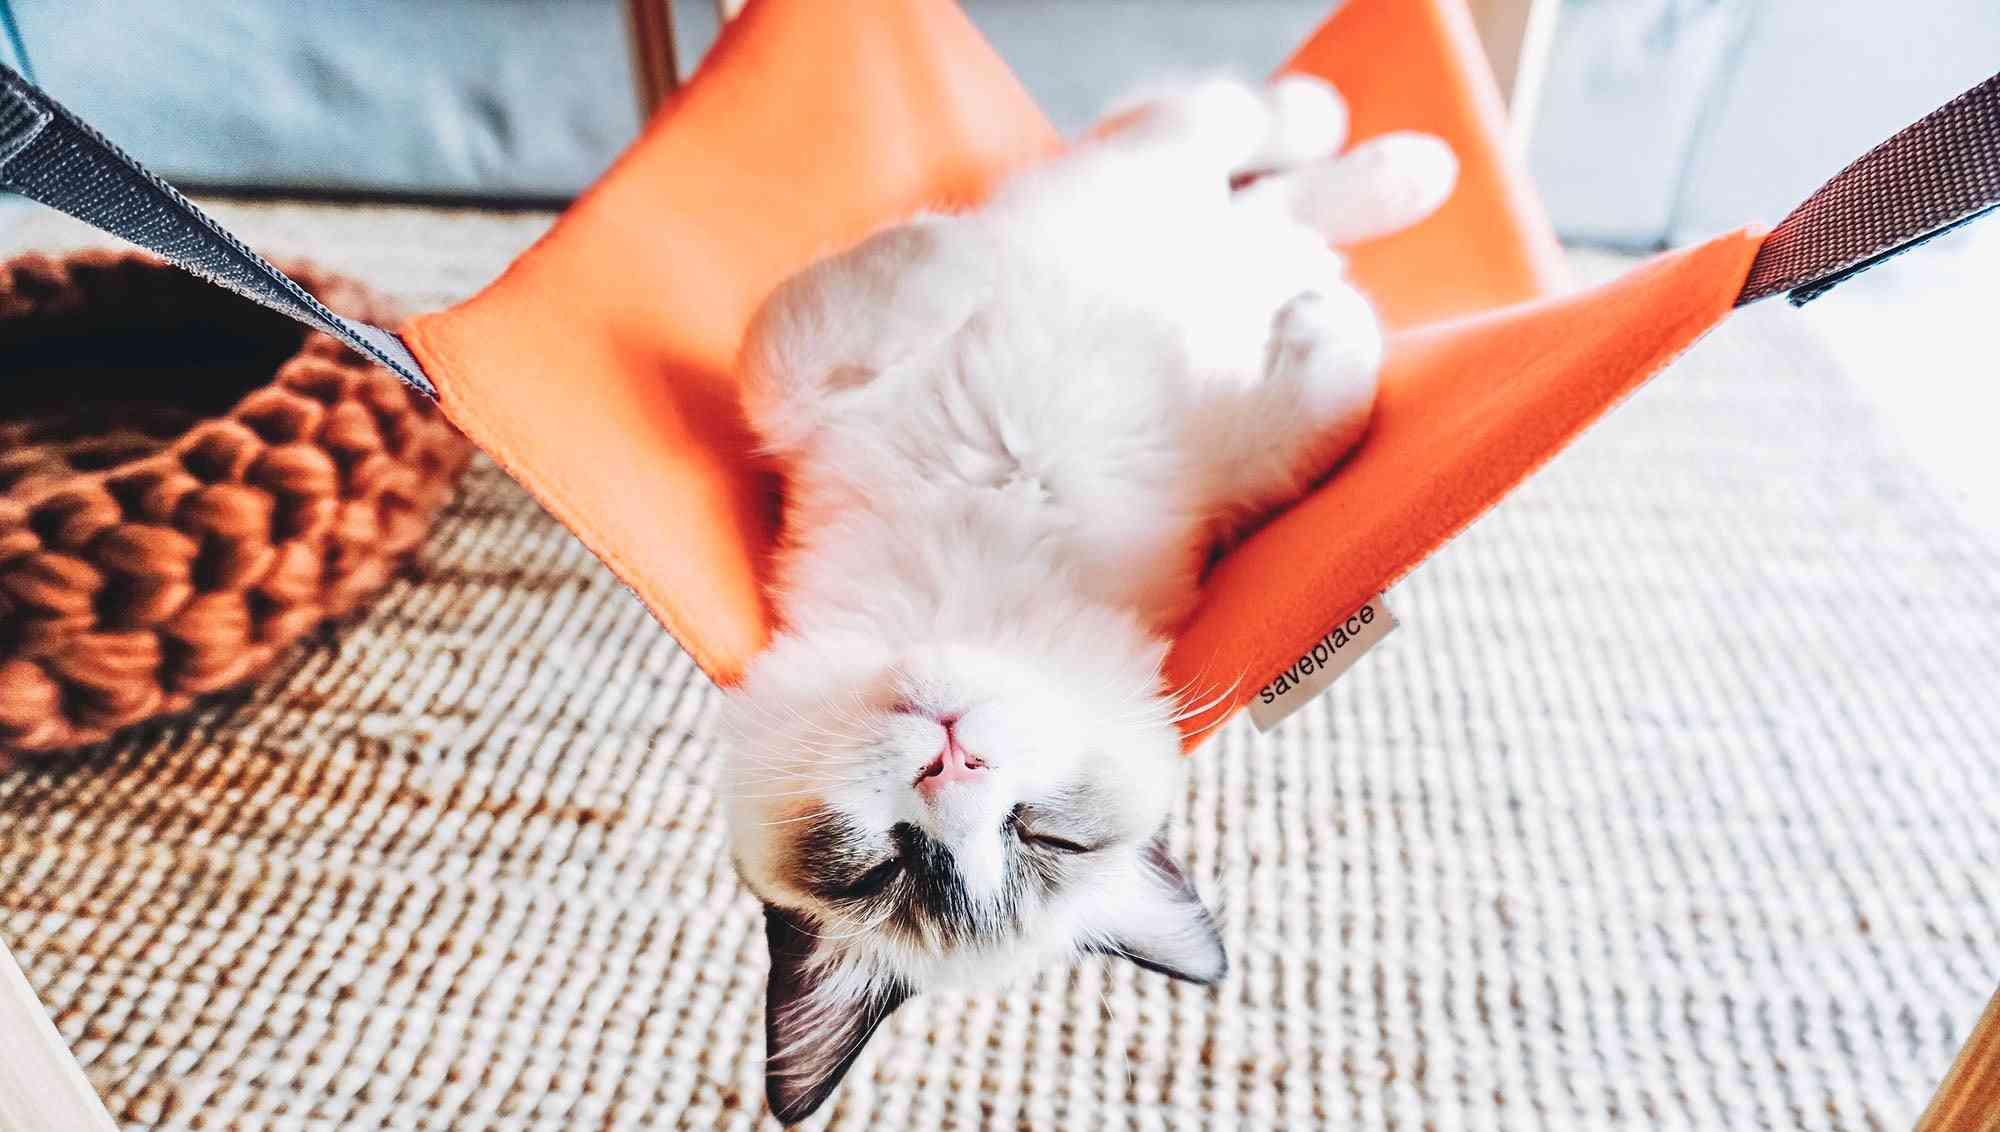 Juicy Orange Saveplace® Hammock For Storage & Pets, Fleece